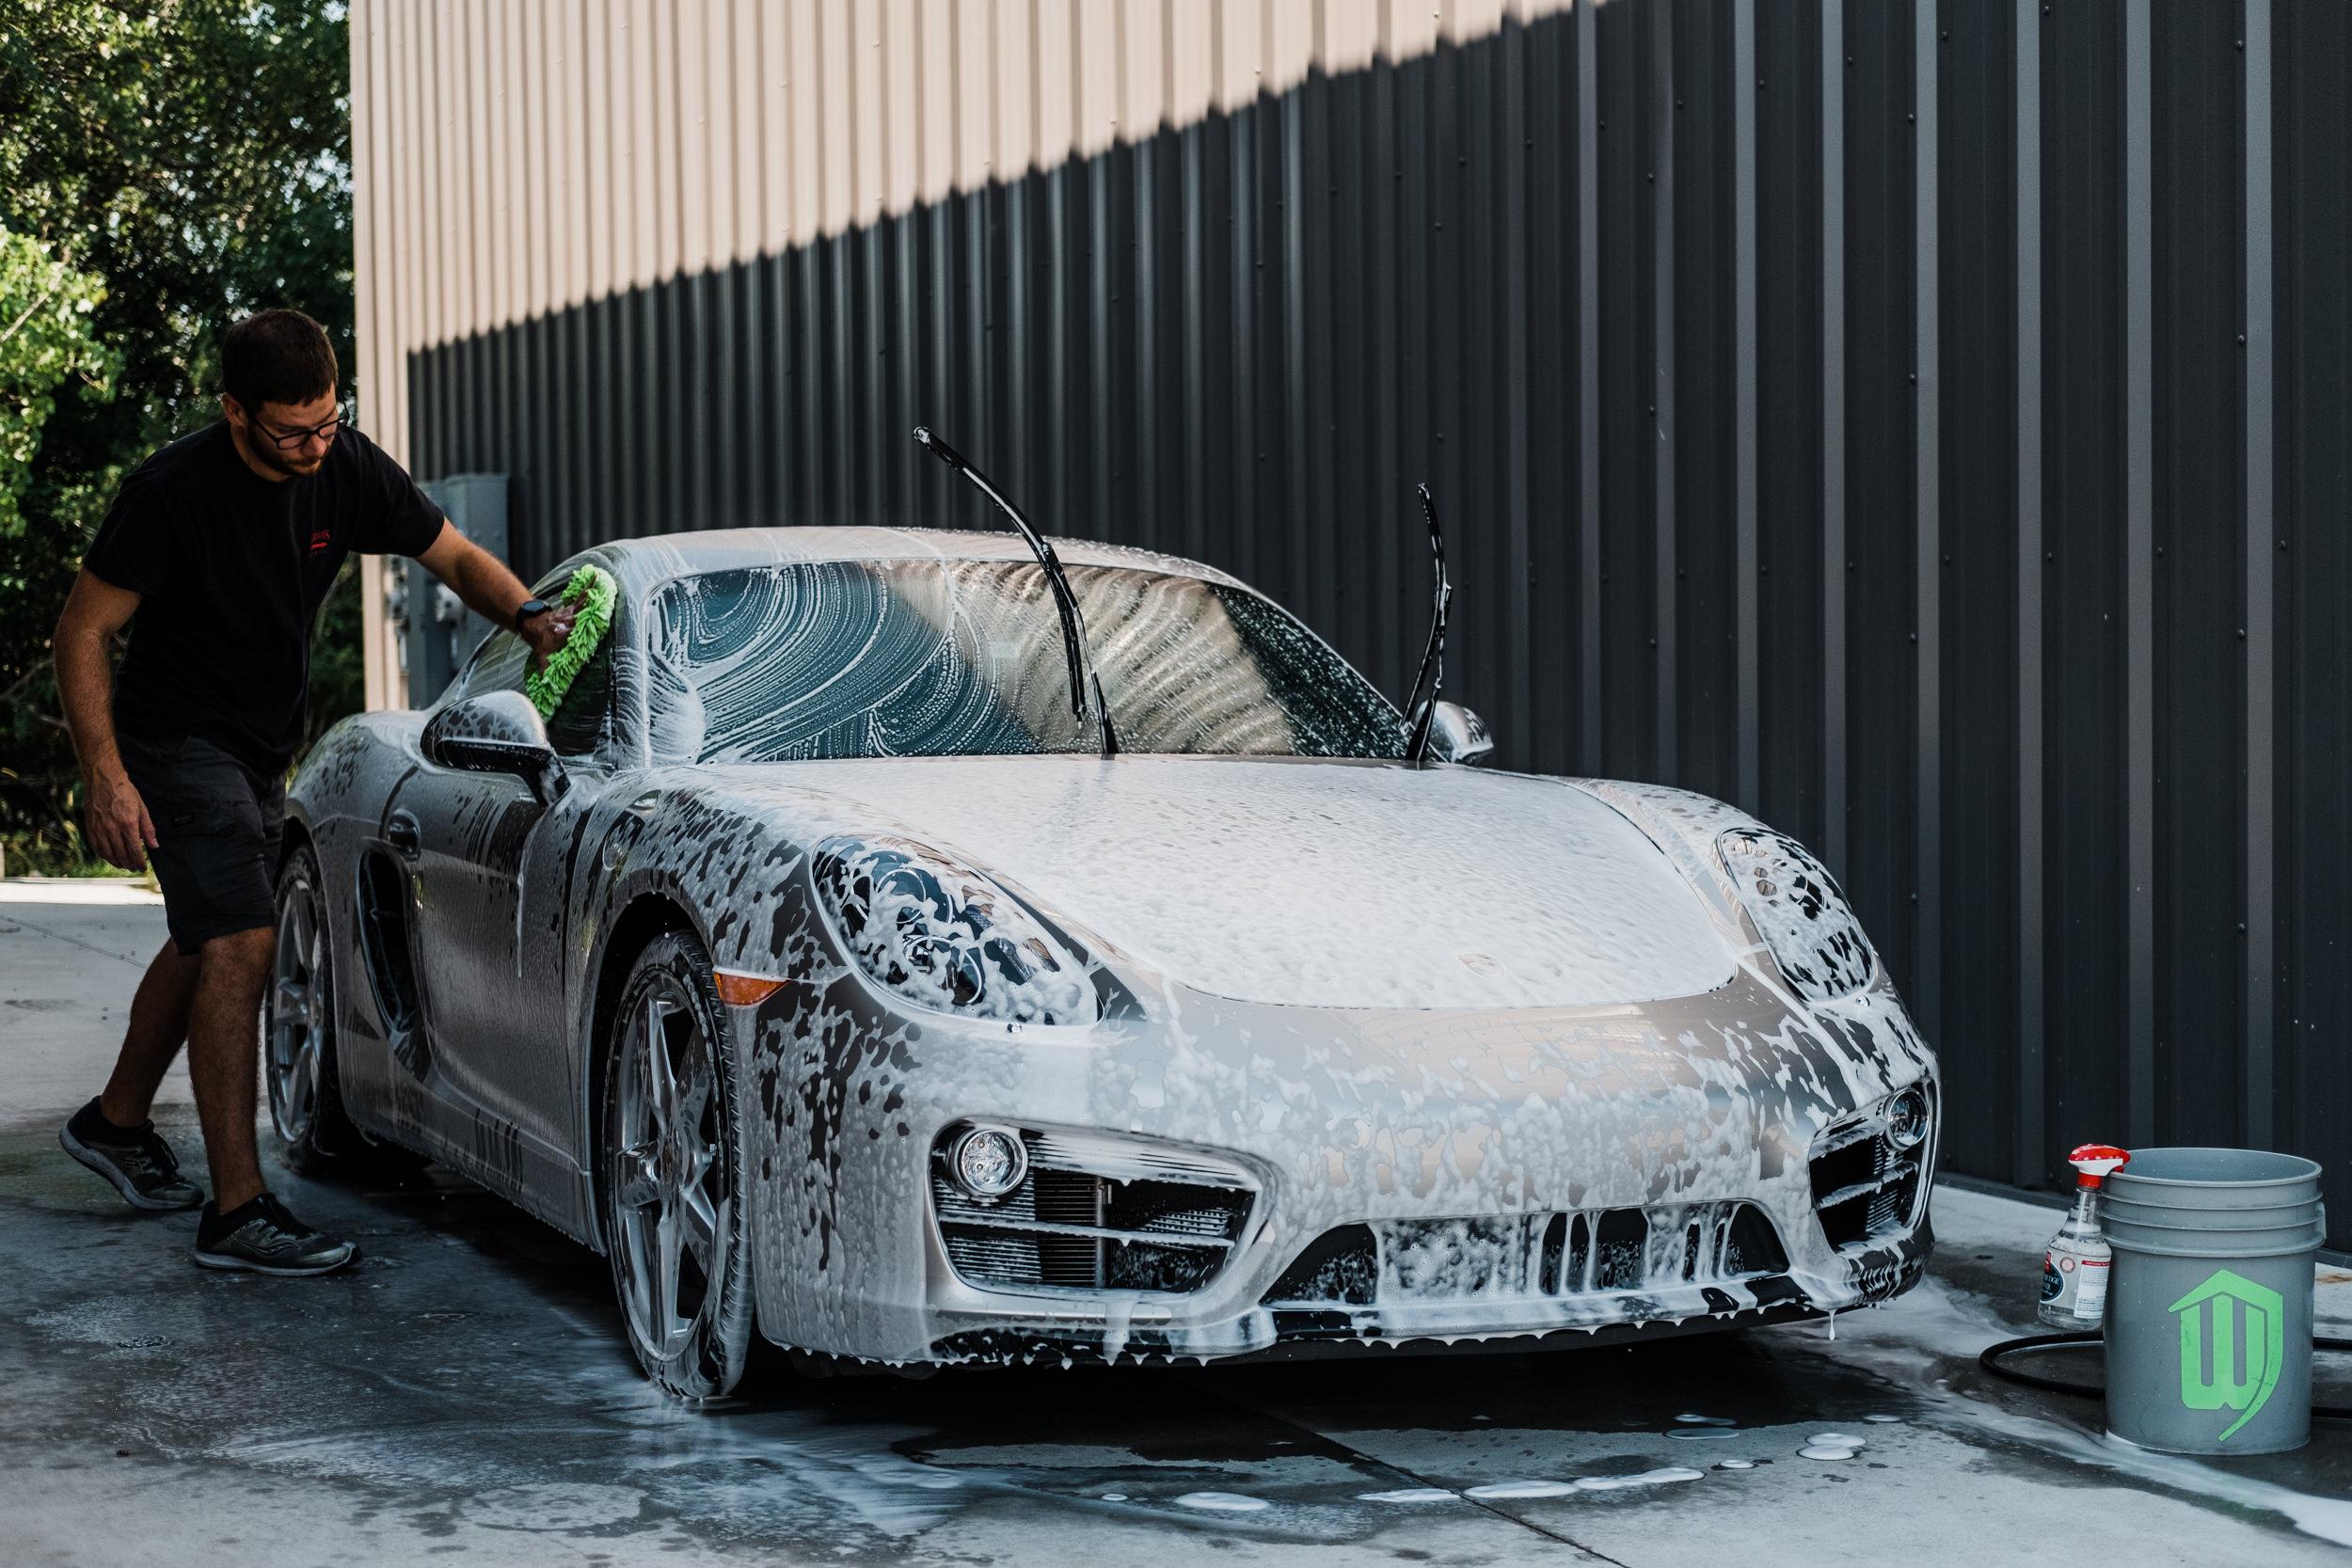 Porsche Cayman - XPEL Paint Protection Film - Clear Bra - Cayman